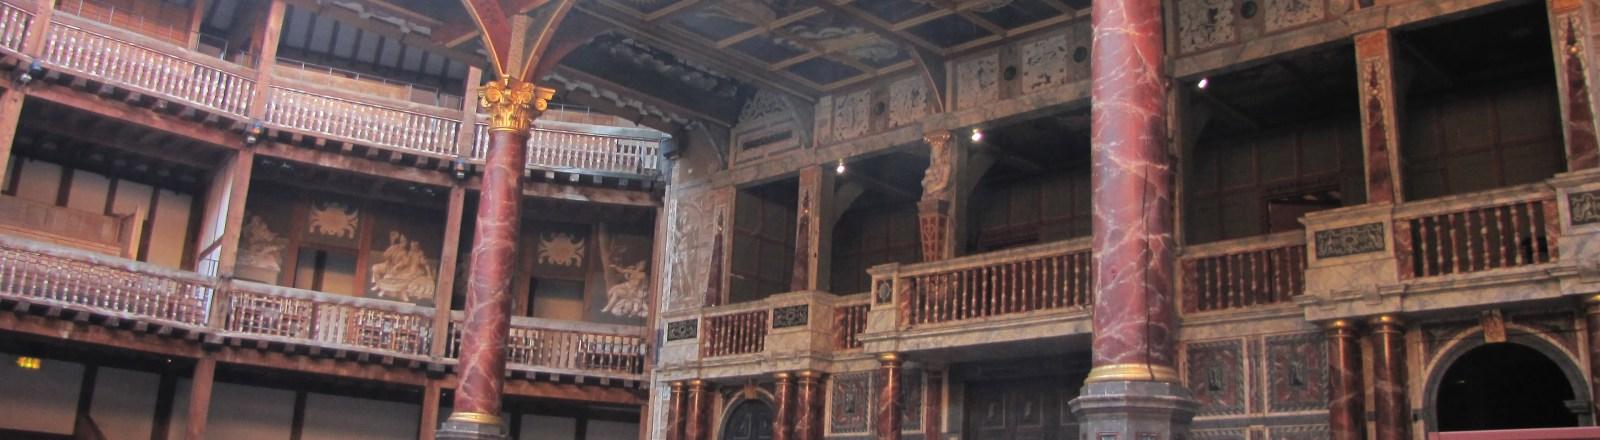 Театр Шекспира.